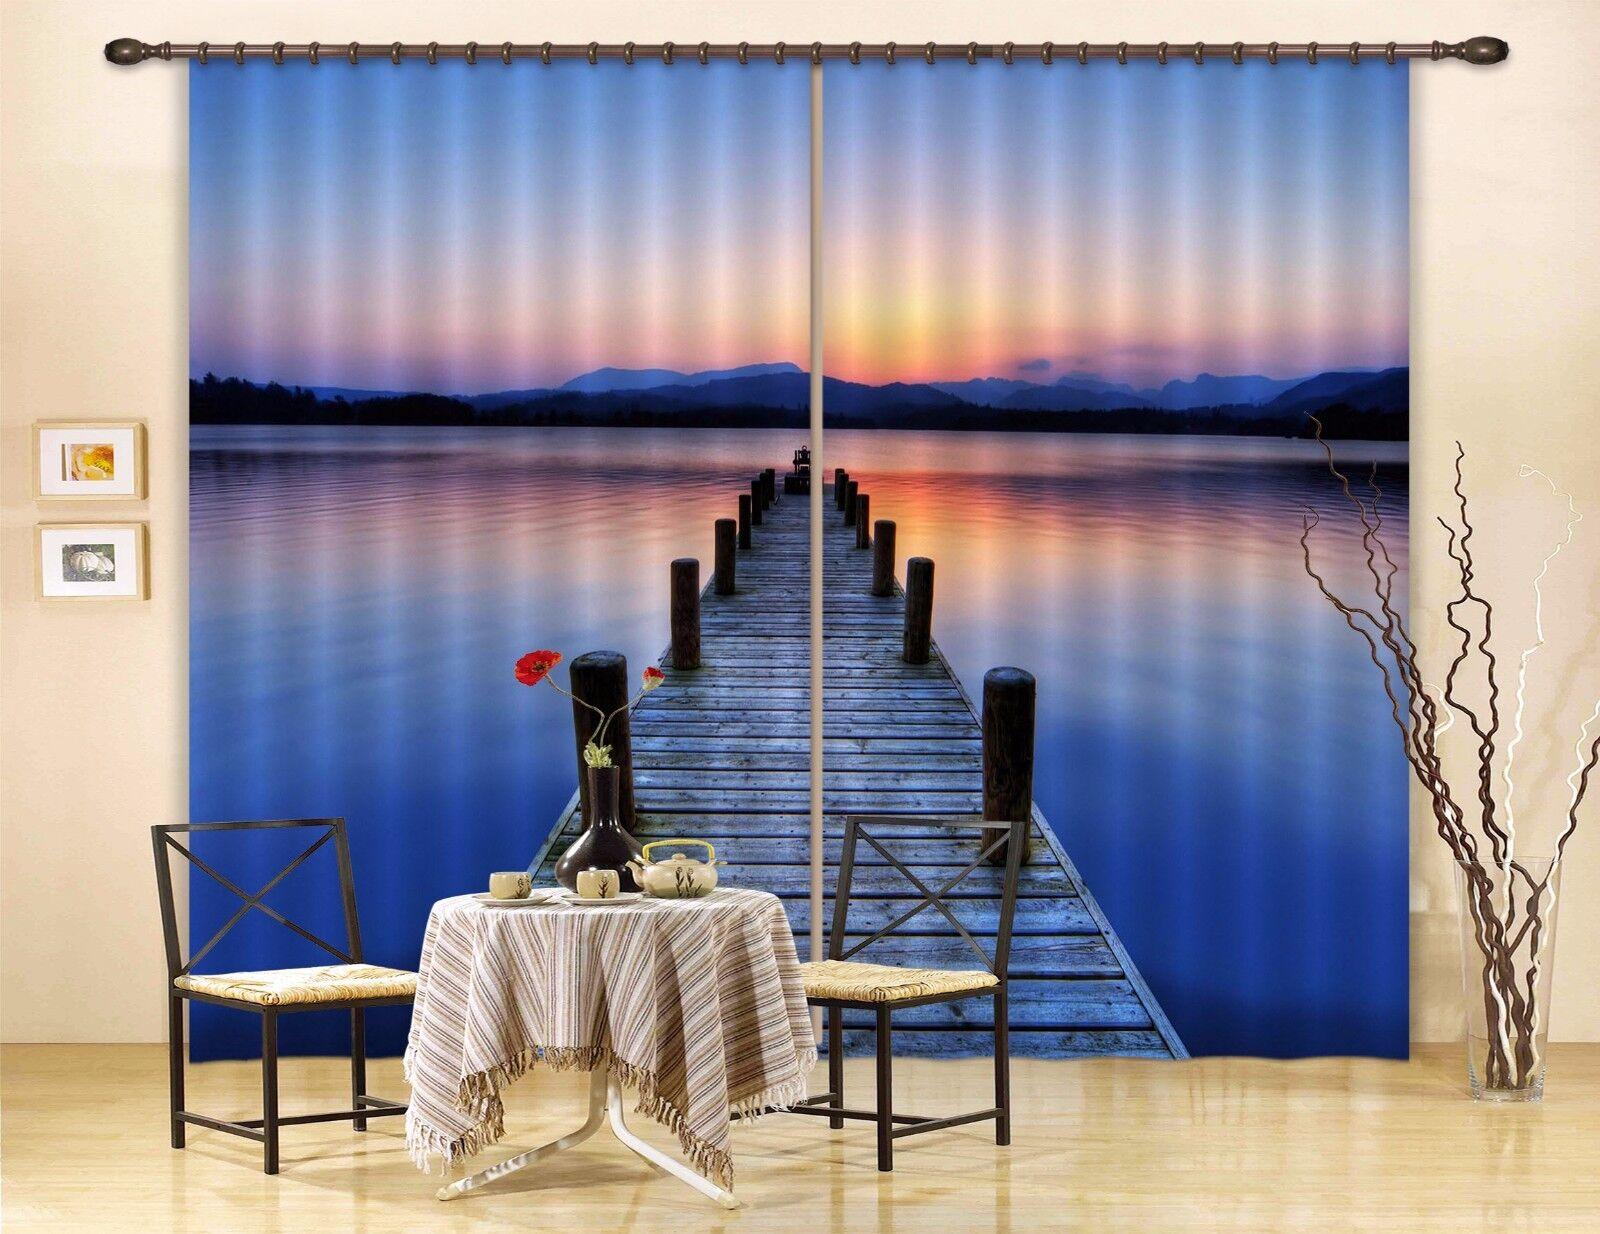 3D puente Sky 9 Cortinas de impresión de cortina de foto Blockout Tela Cortinas Ventana Reino Unido